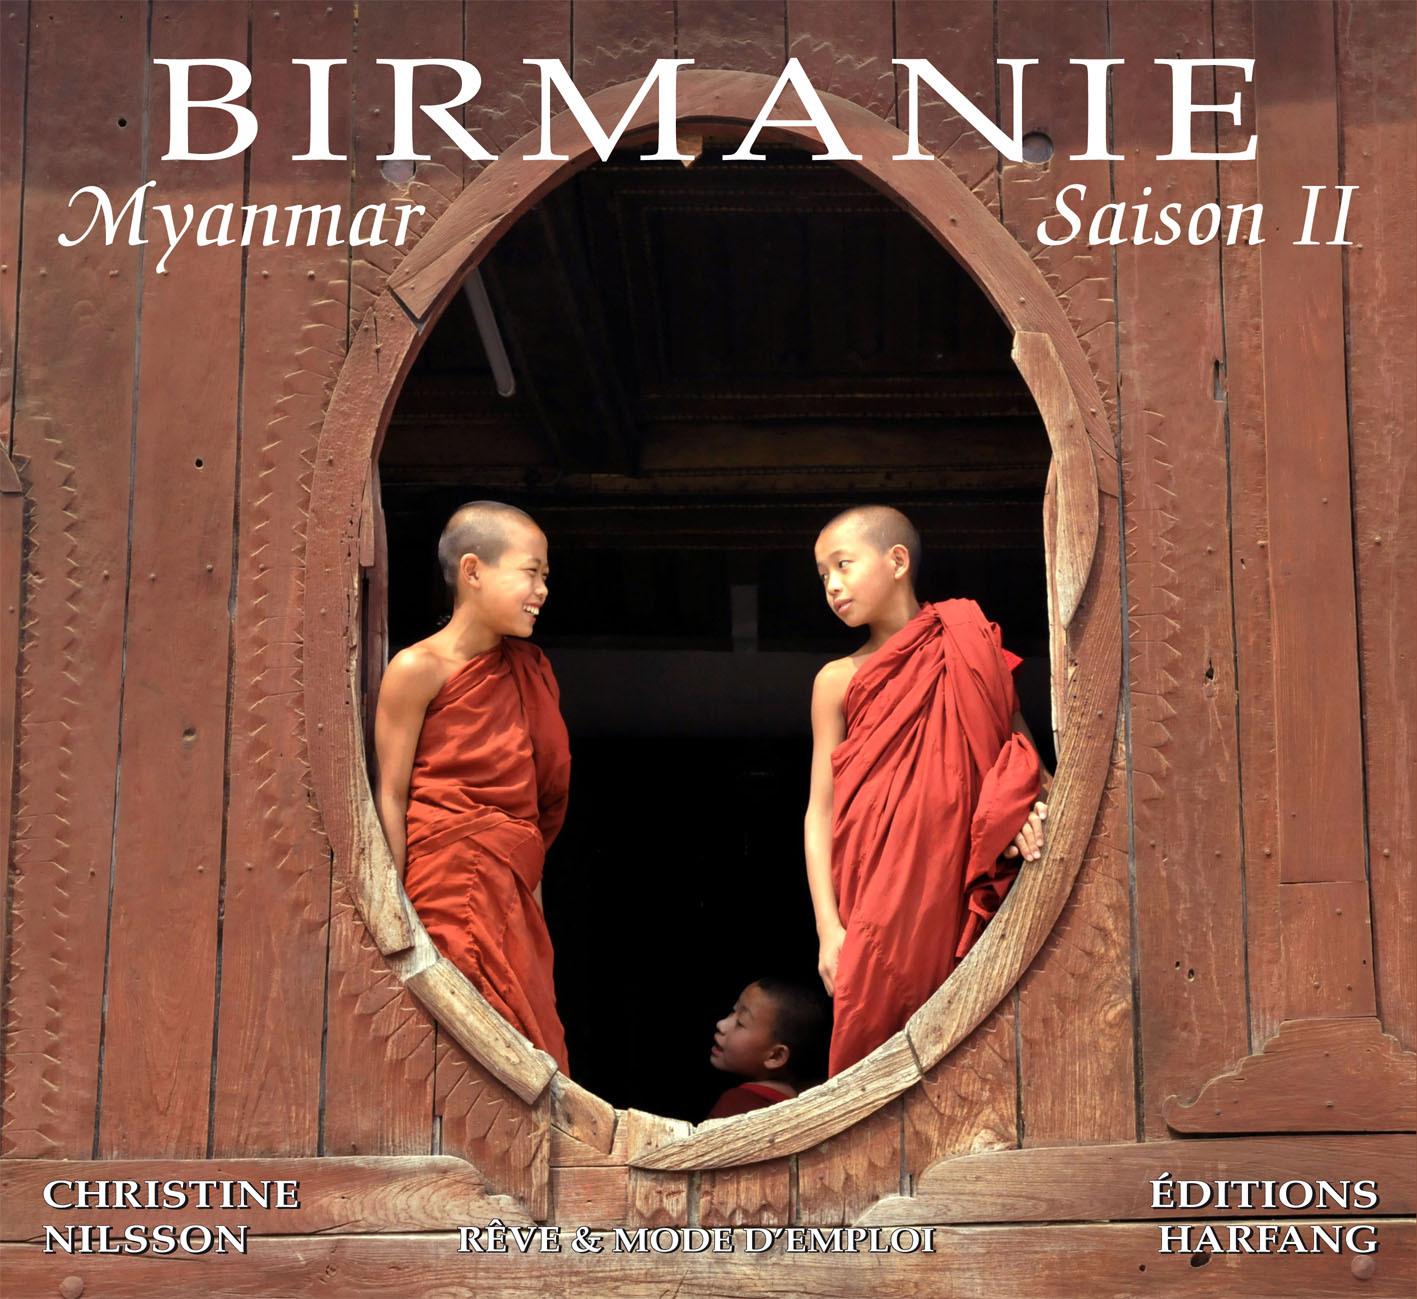 BIRMANIE MYANMAR SAISON II